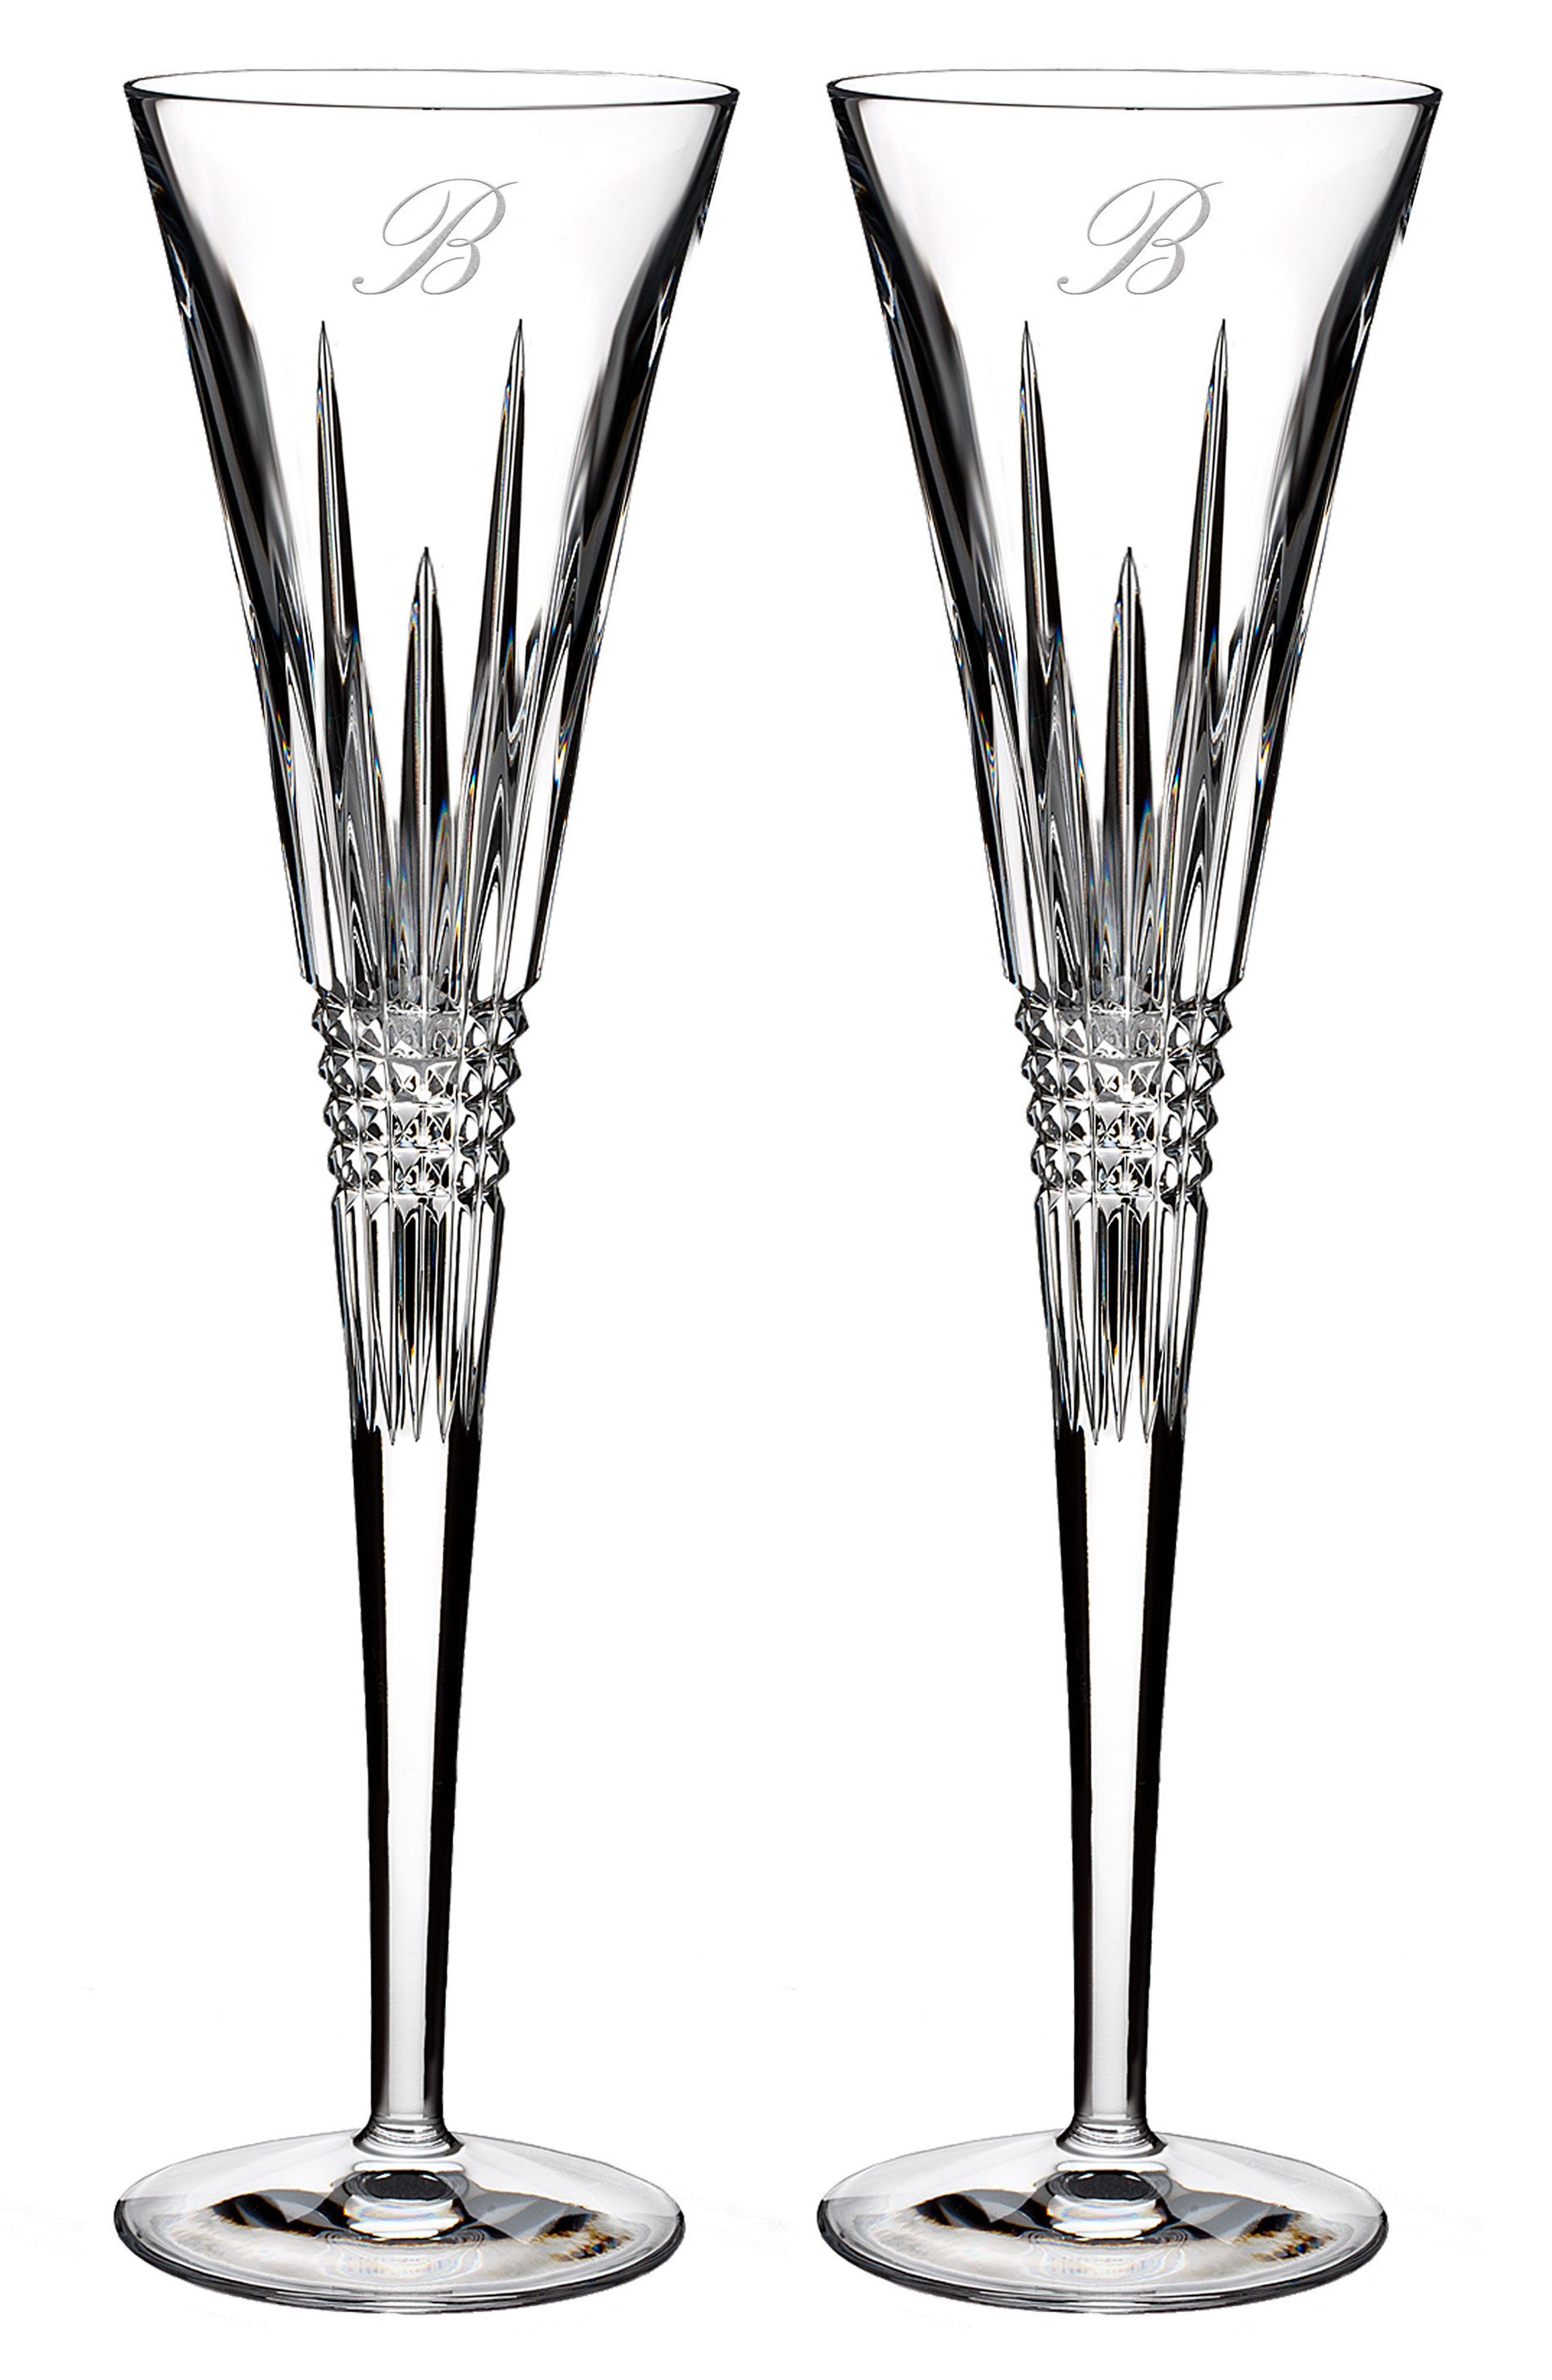 Lismore Diamond Set of 2 Monogram Lead Crystal Champagne Flutes,                         Main,                         color, CLEAR - B